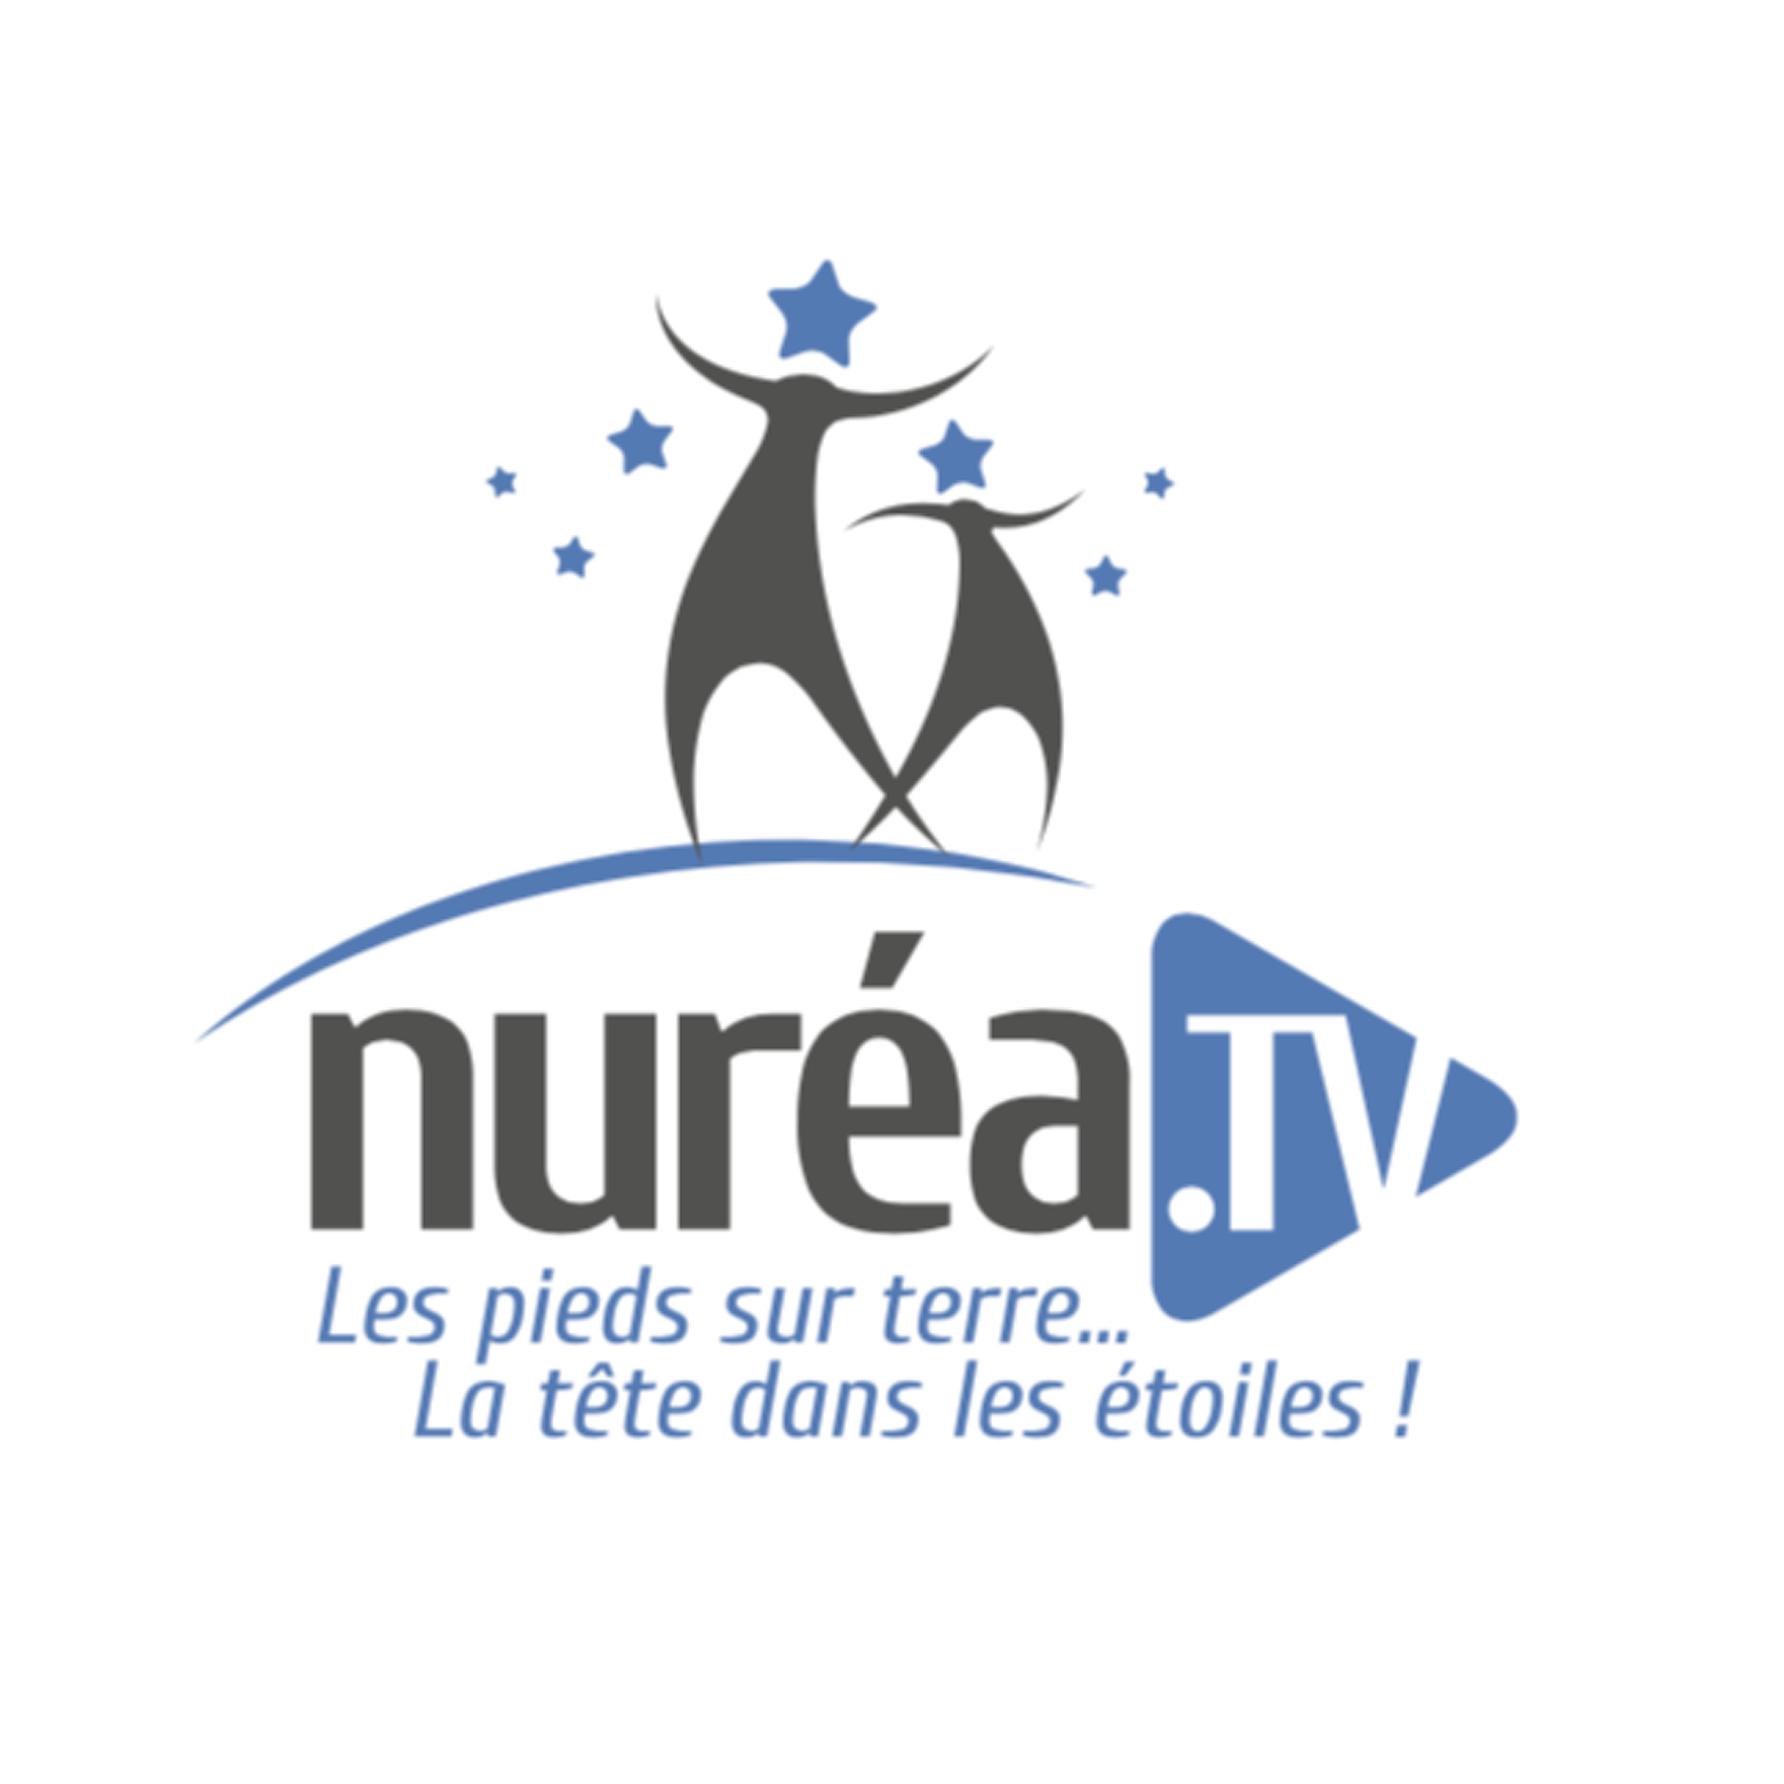 NURÉA TV